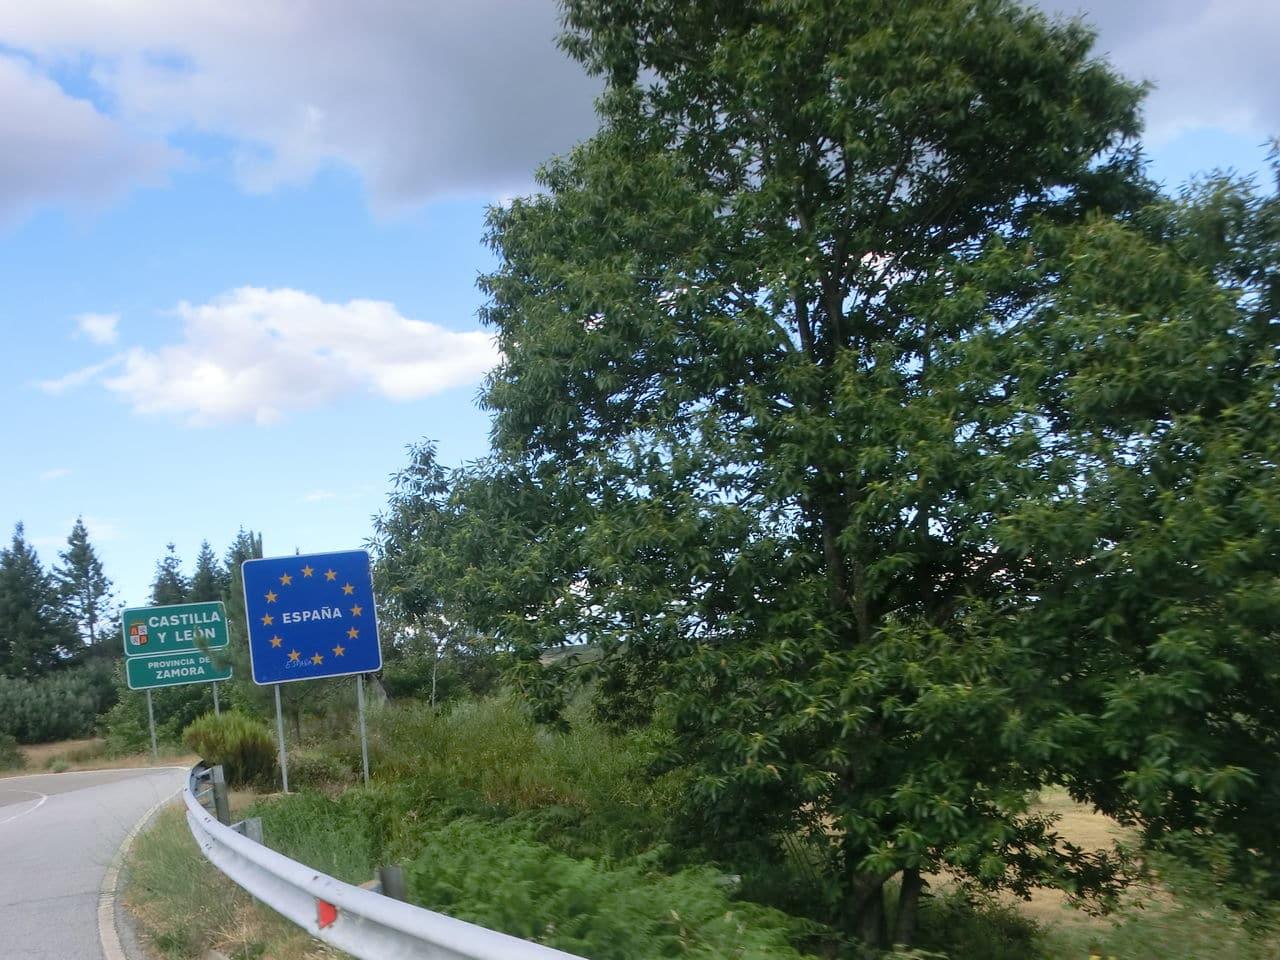 Summer roadtrip 2015 - Picos da Europa CIMG6255